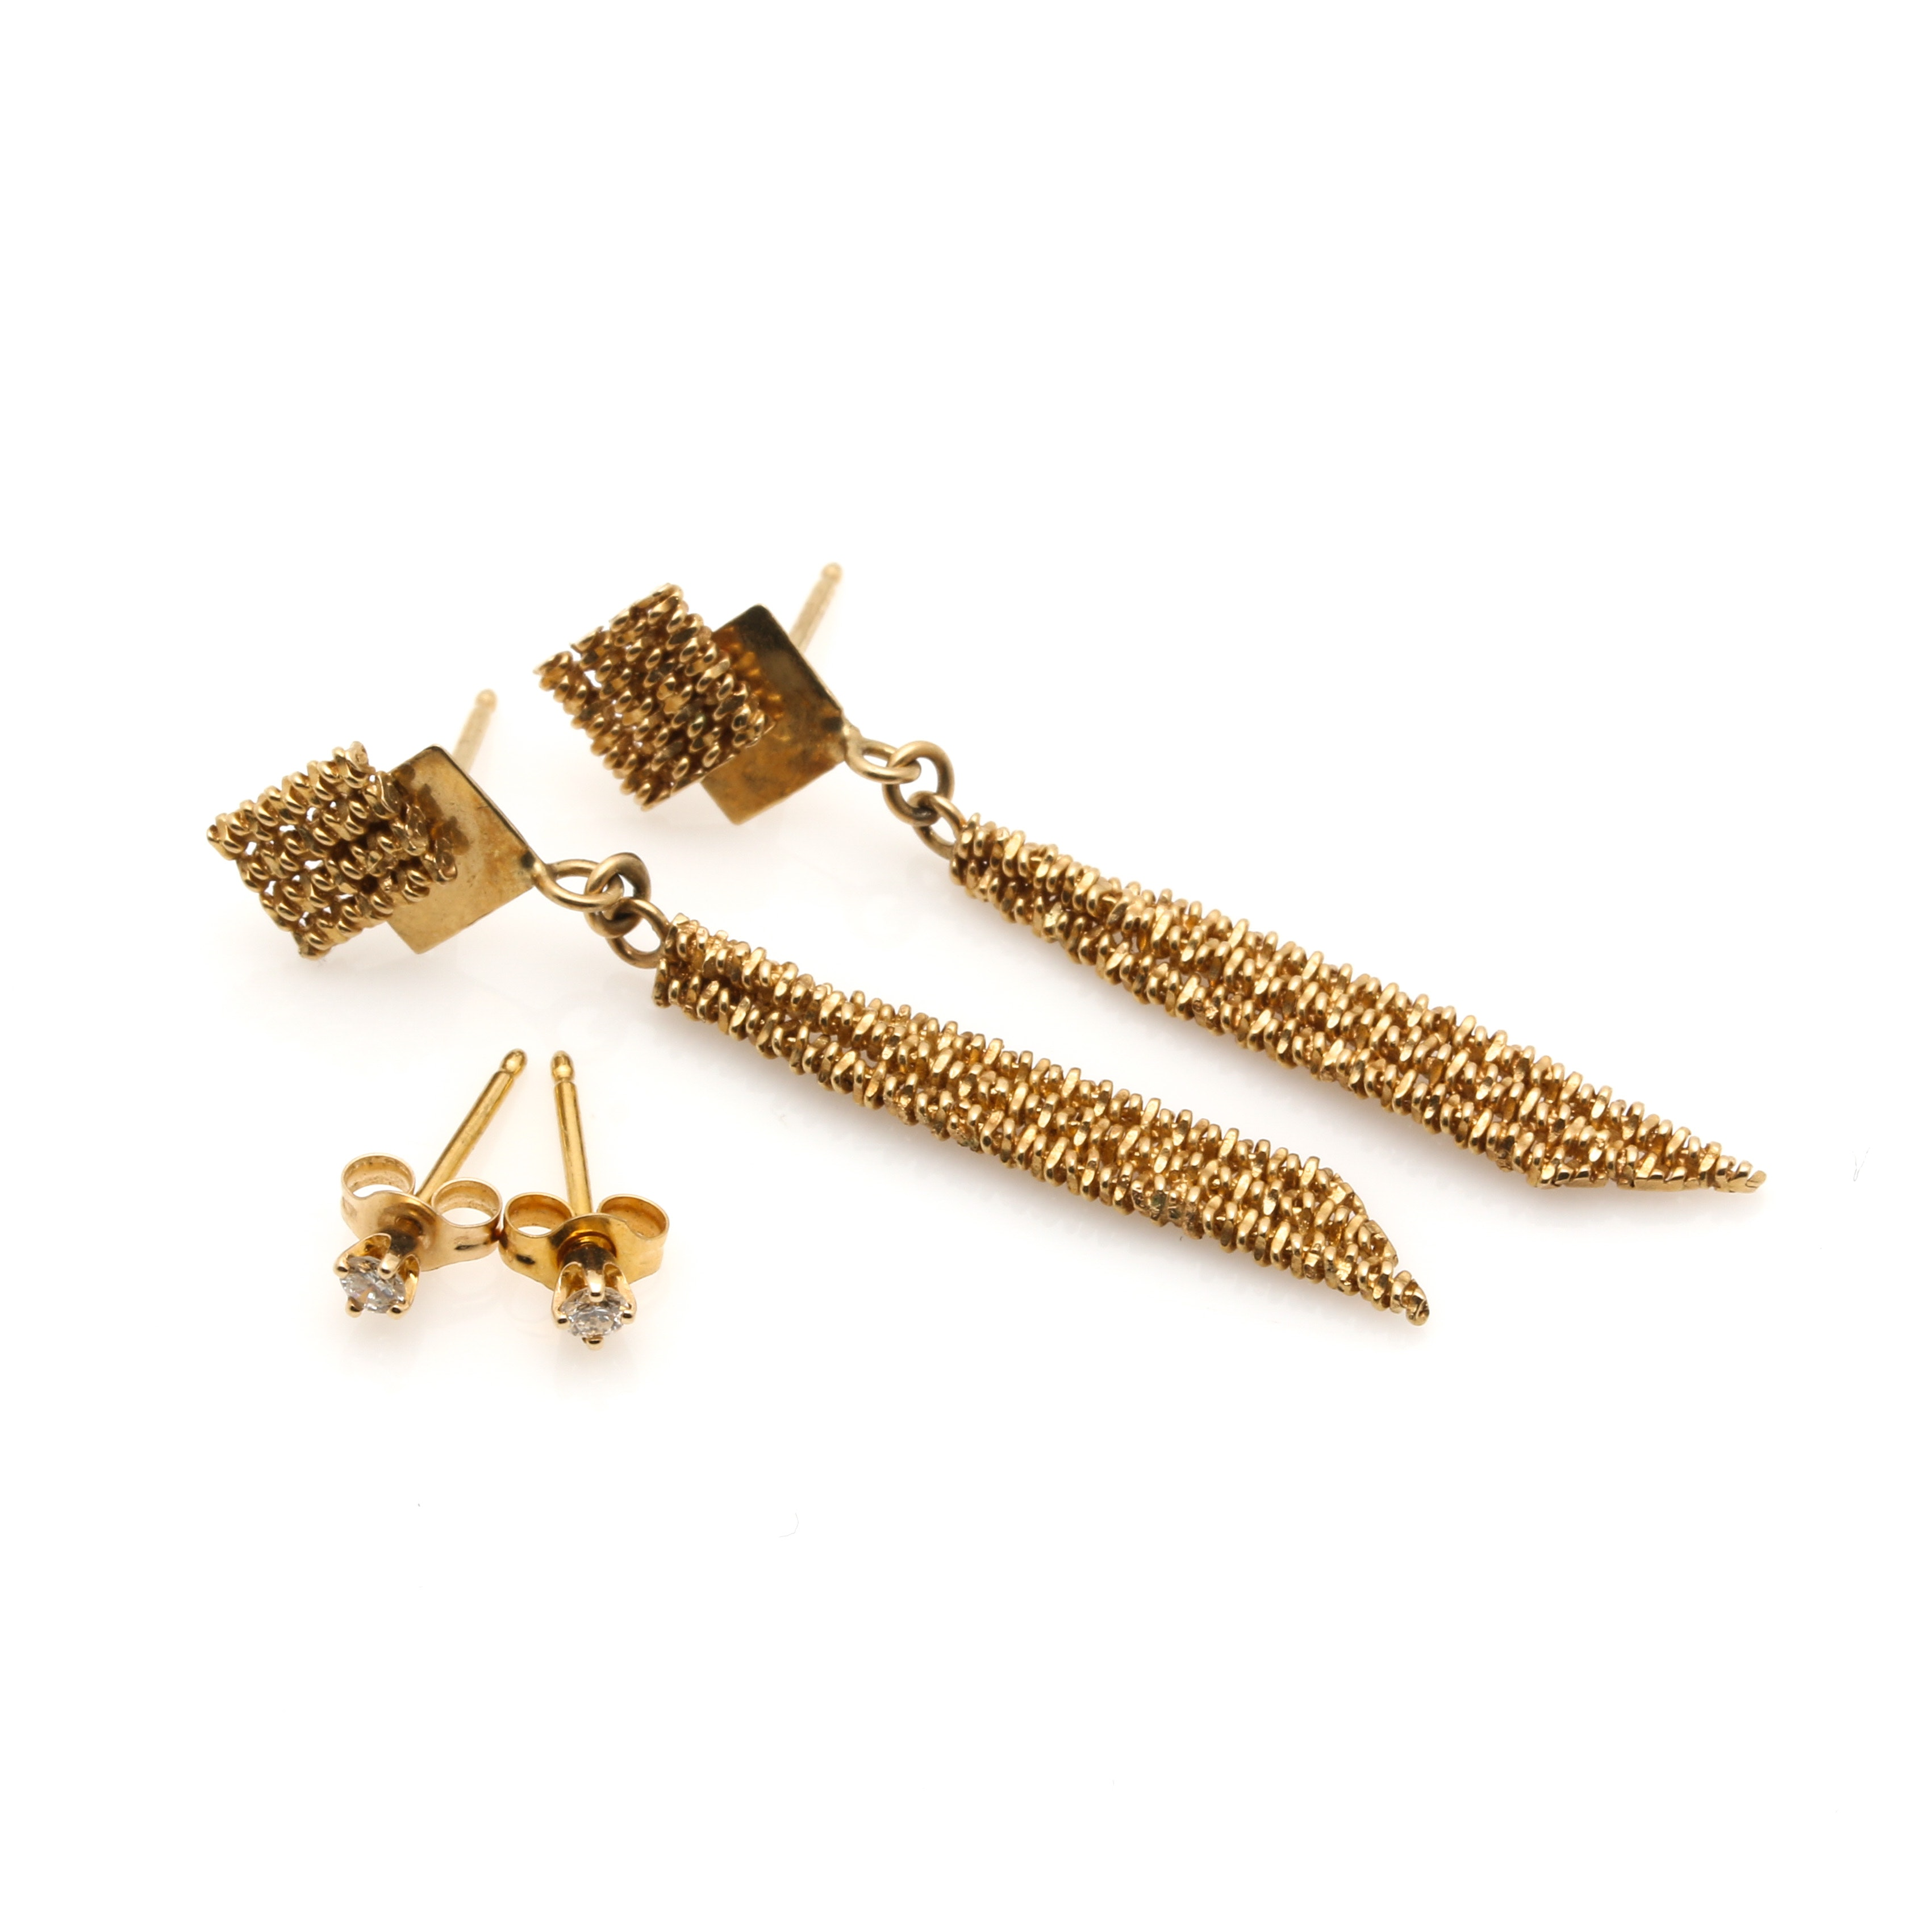 14K Yellow Gold Diamond Stud Earrings and Geometric Drop Earrings